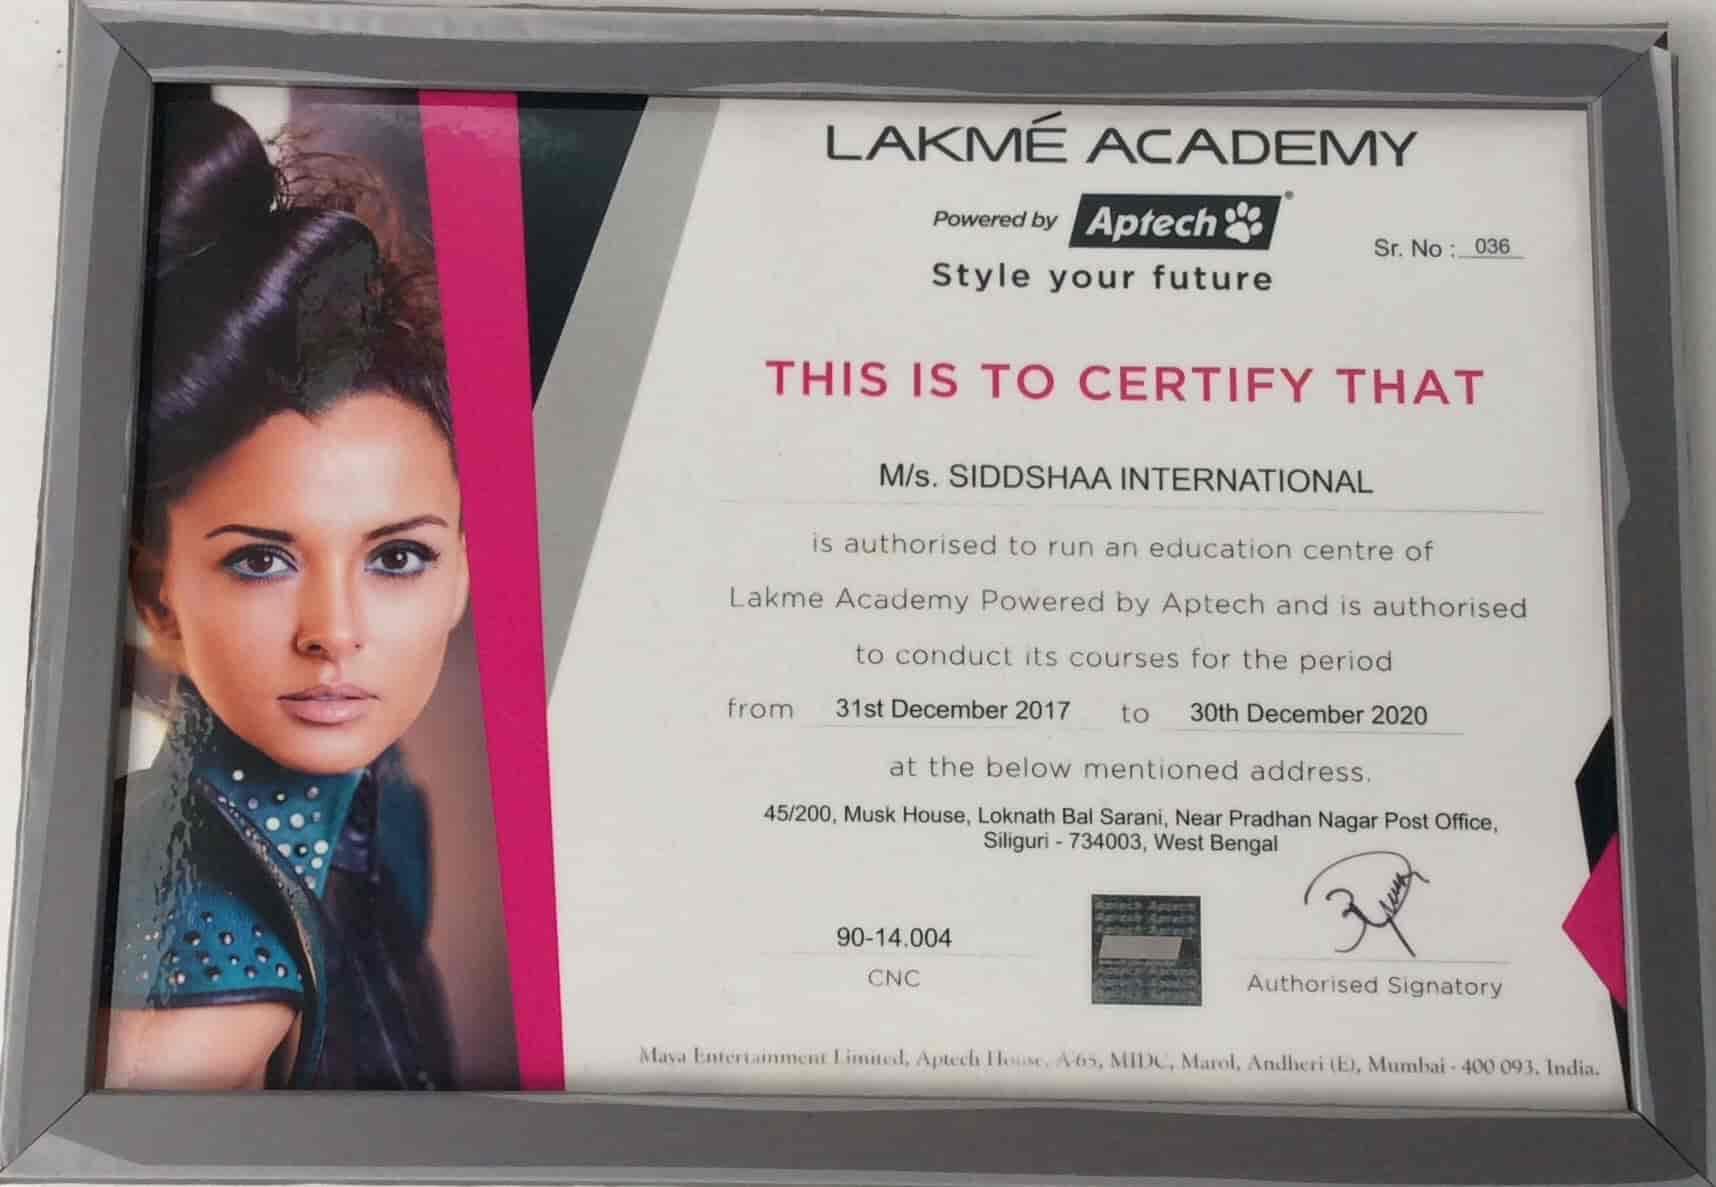 Lakme Academy, Pradhan Nagar - Beautician Institutes in Siliguri